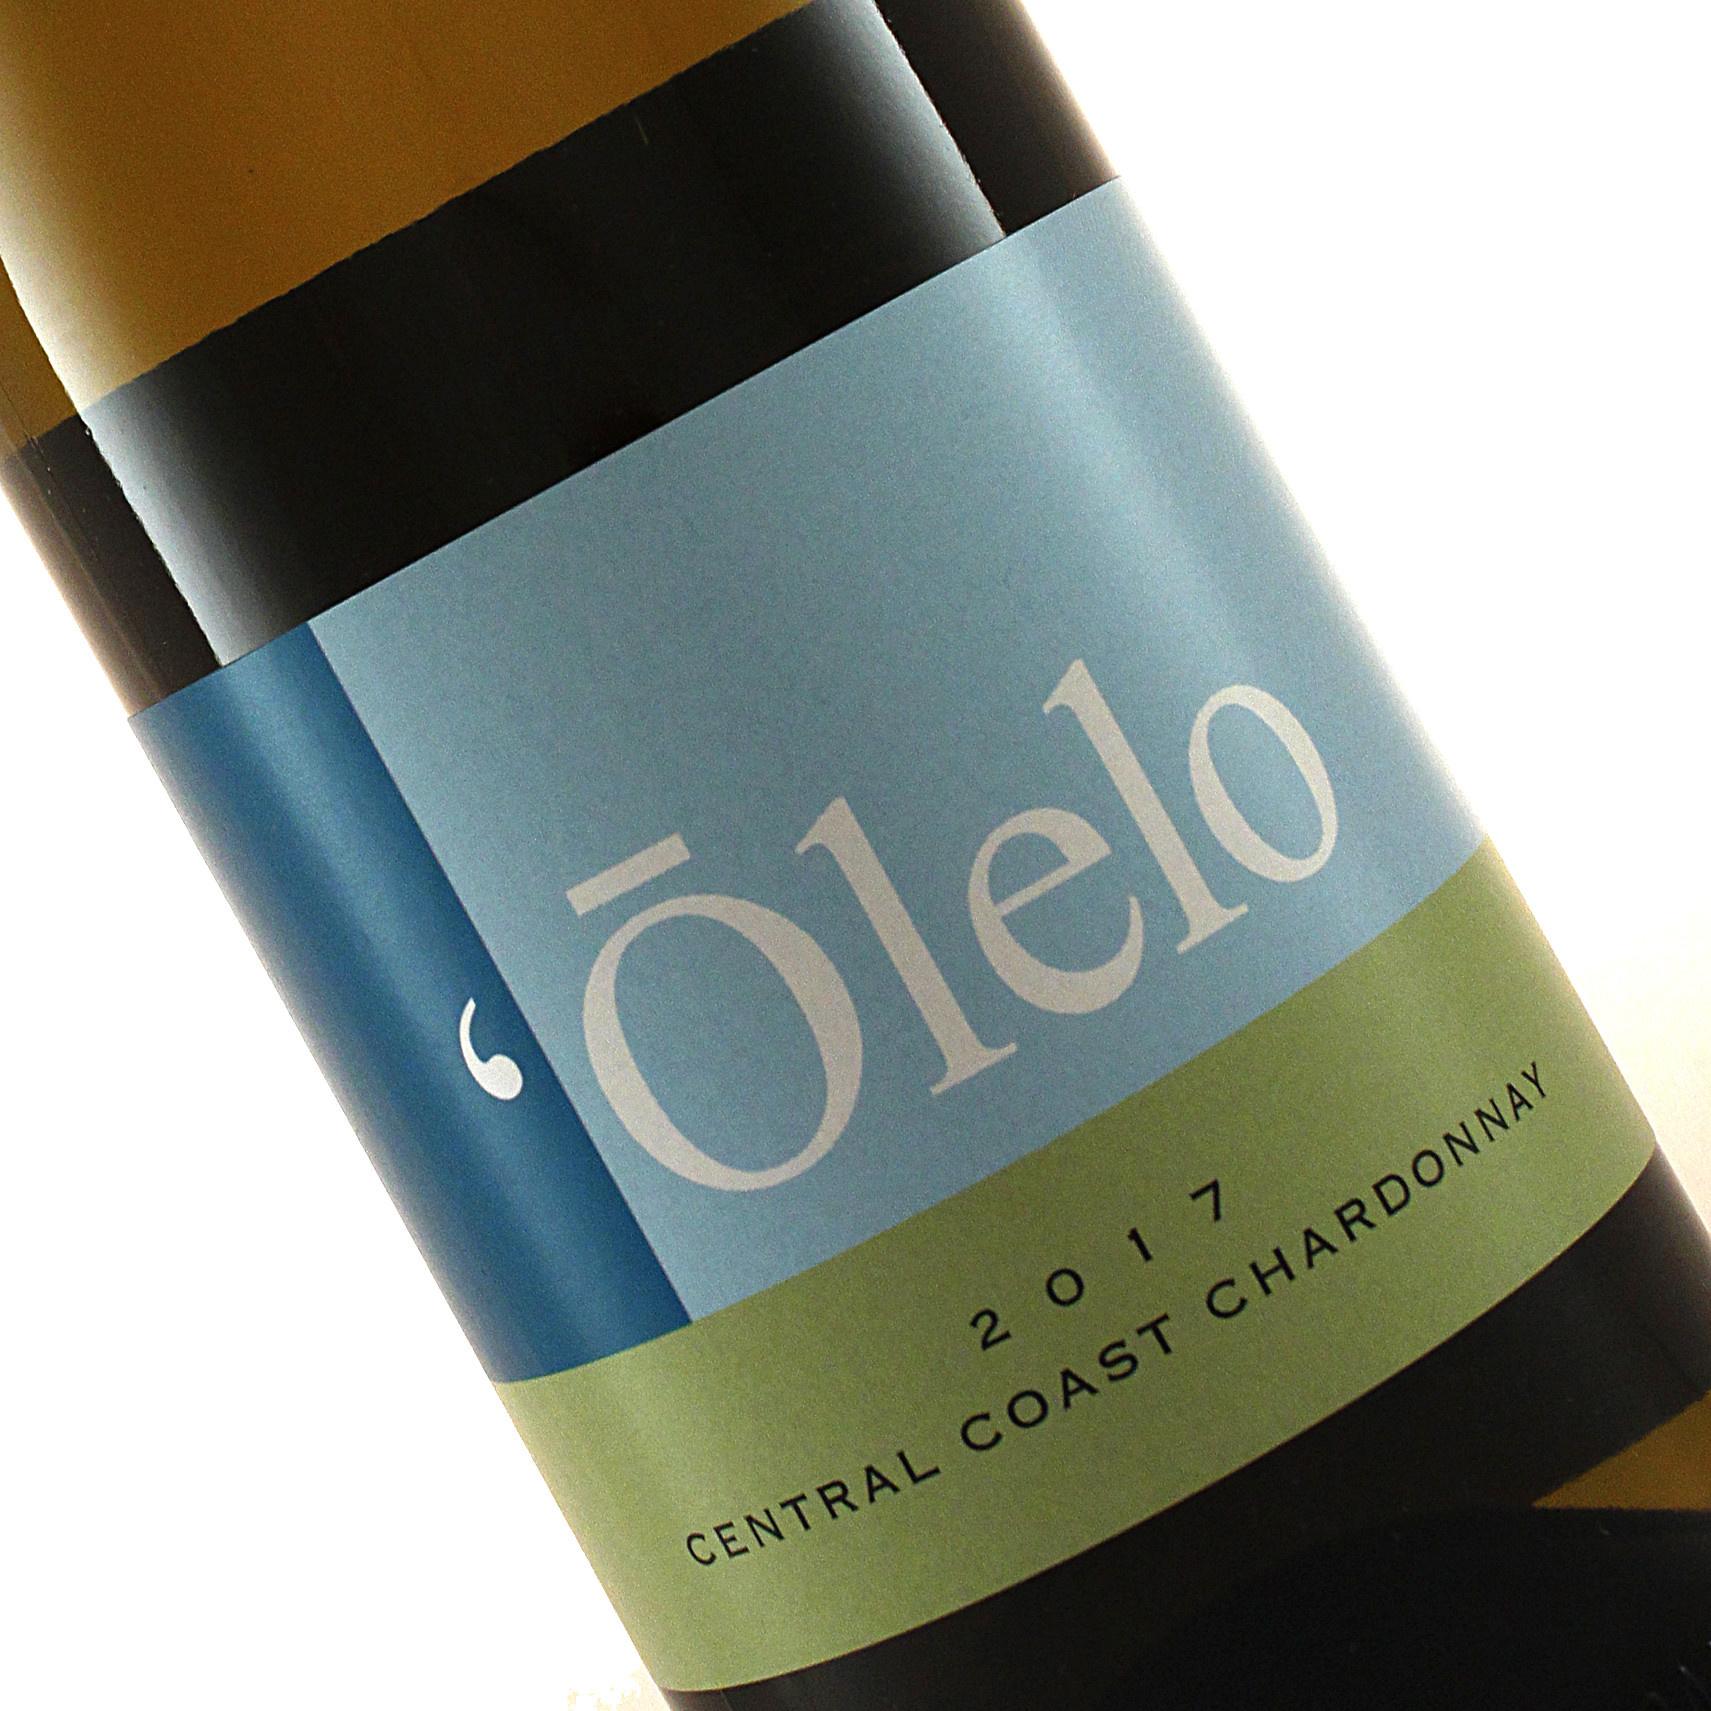 Olelo 2017 Chardonnay Central Coast, California